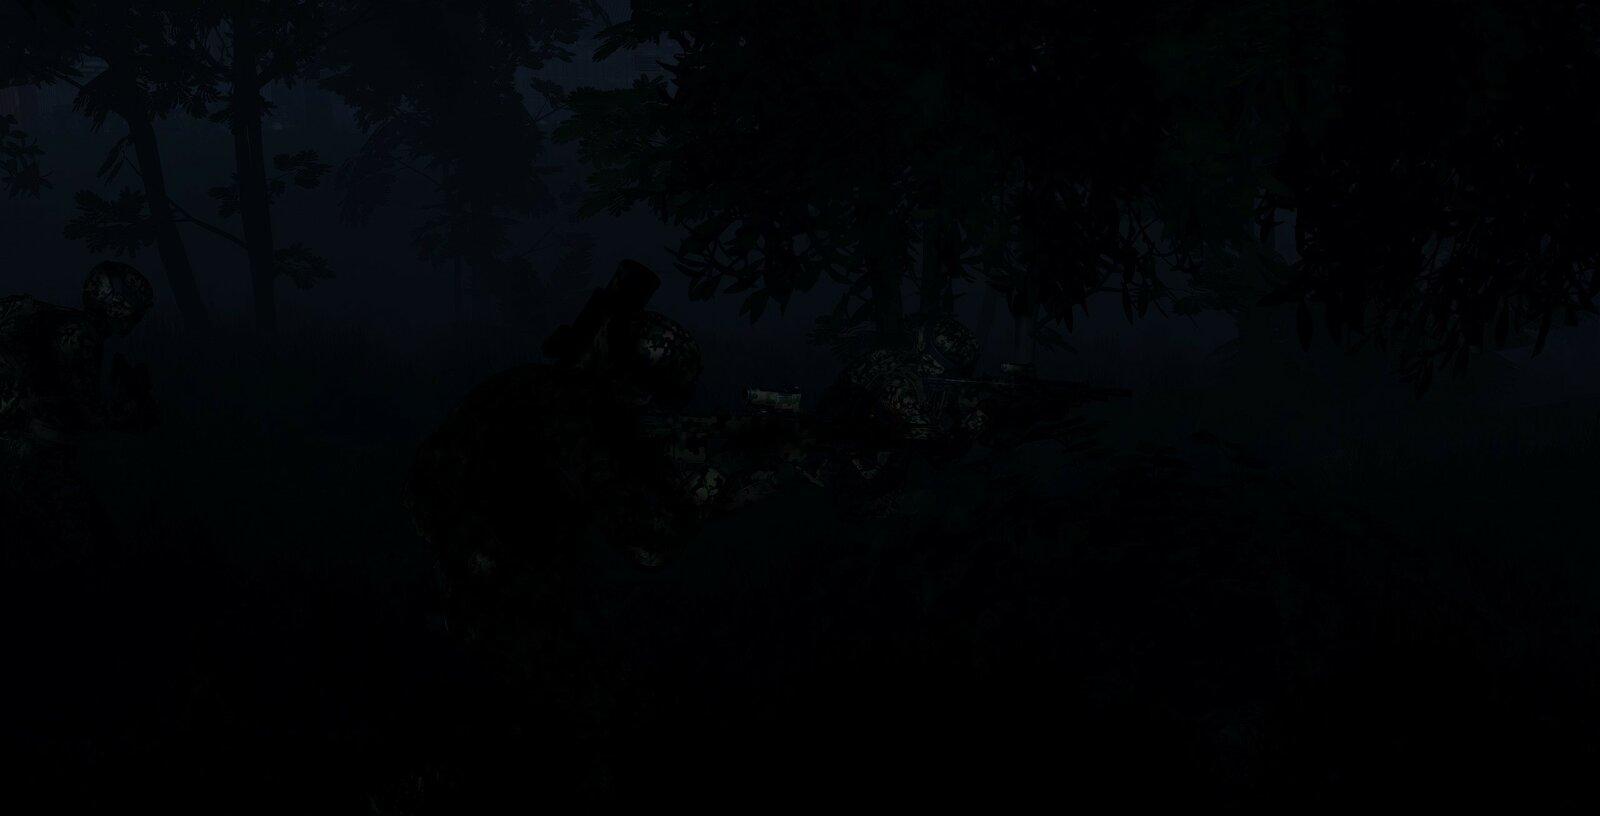 NightOps Team Hydra One